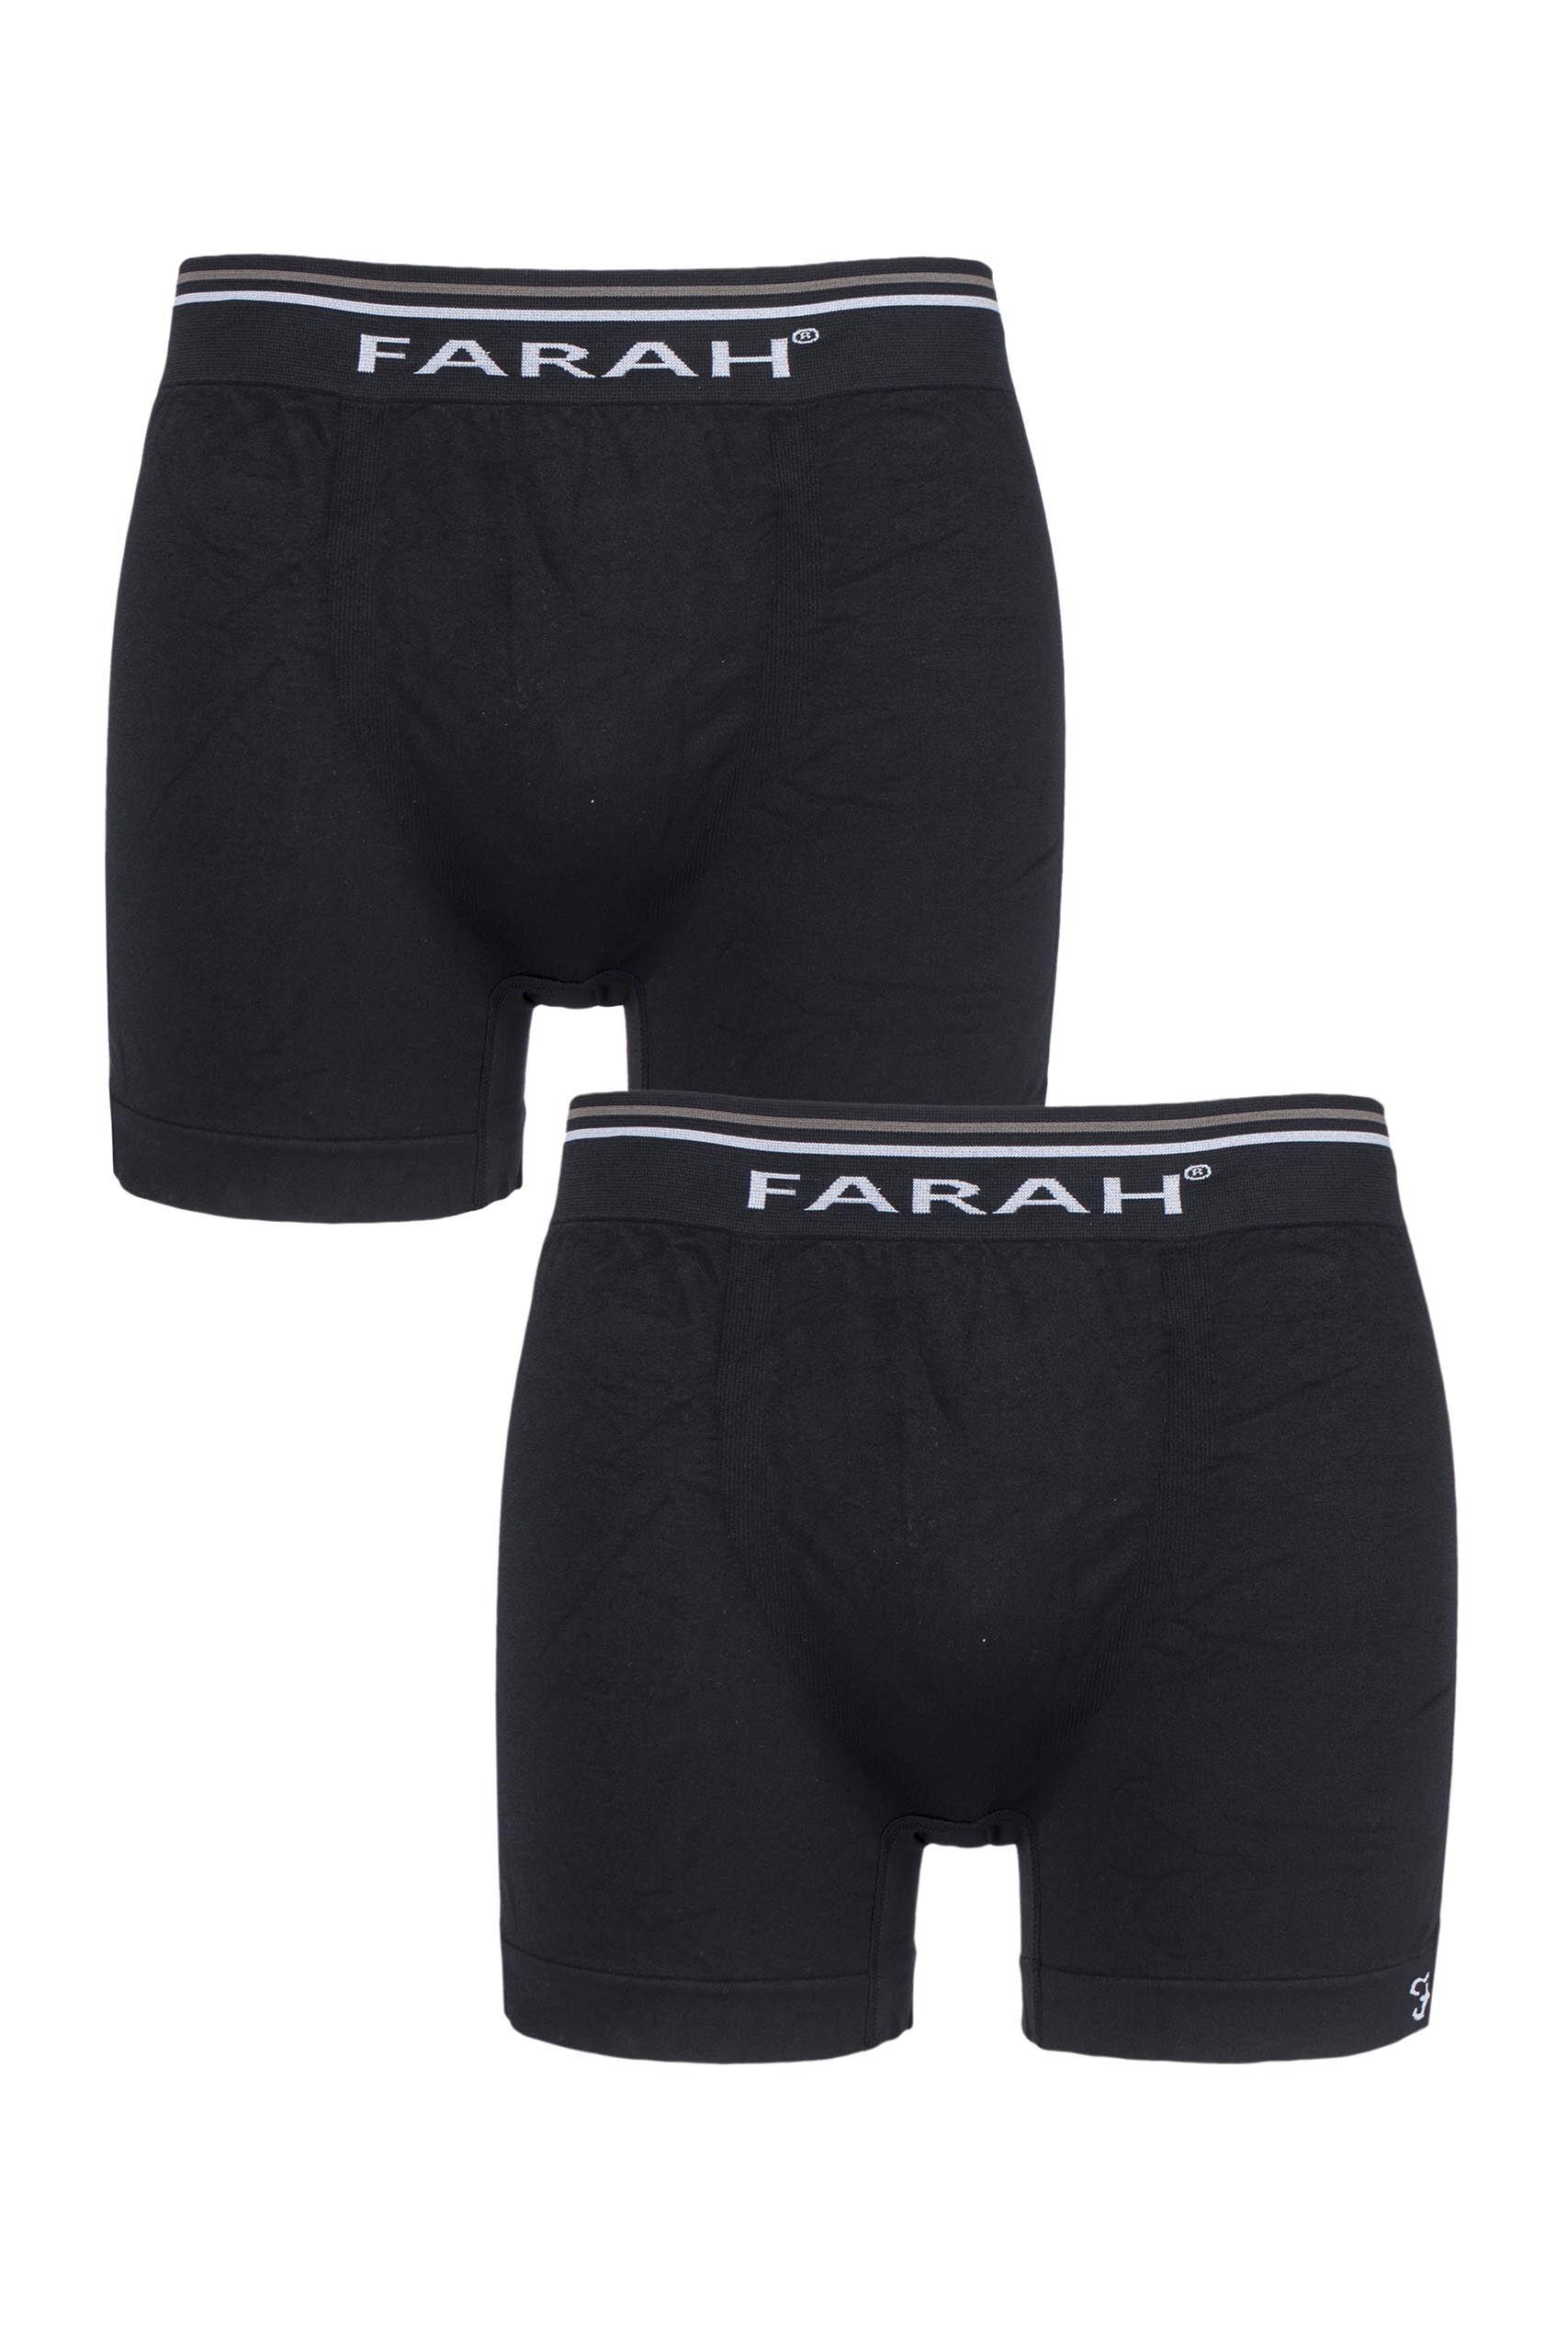 Image of 2 Pack Black Seamless Boxer Shorts Men's Medium - Farah